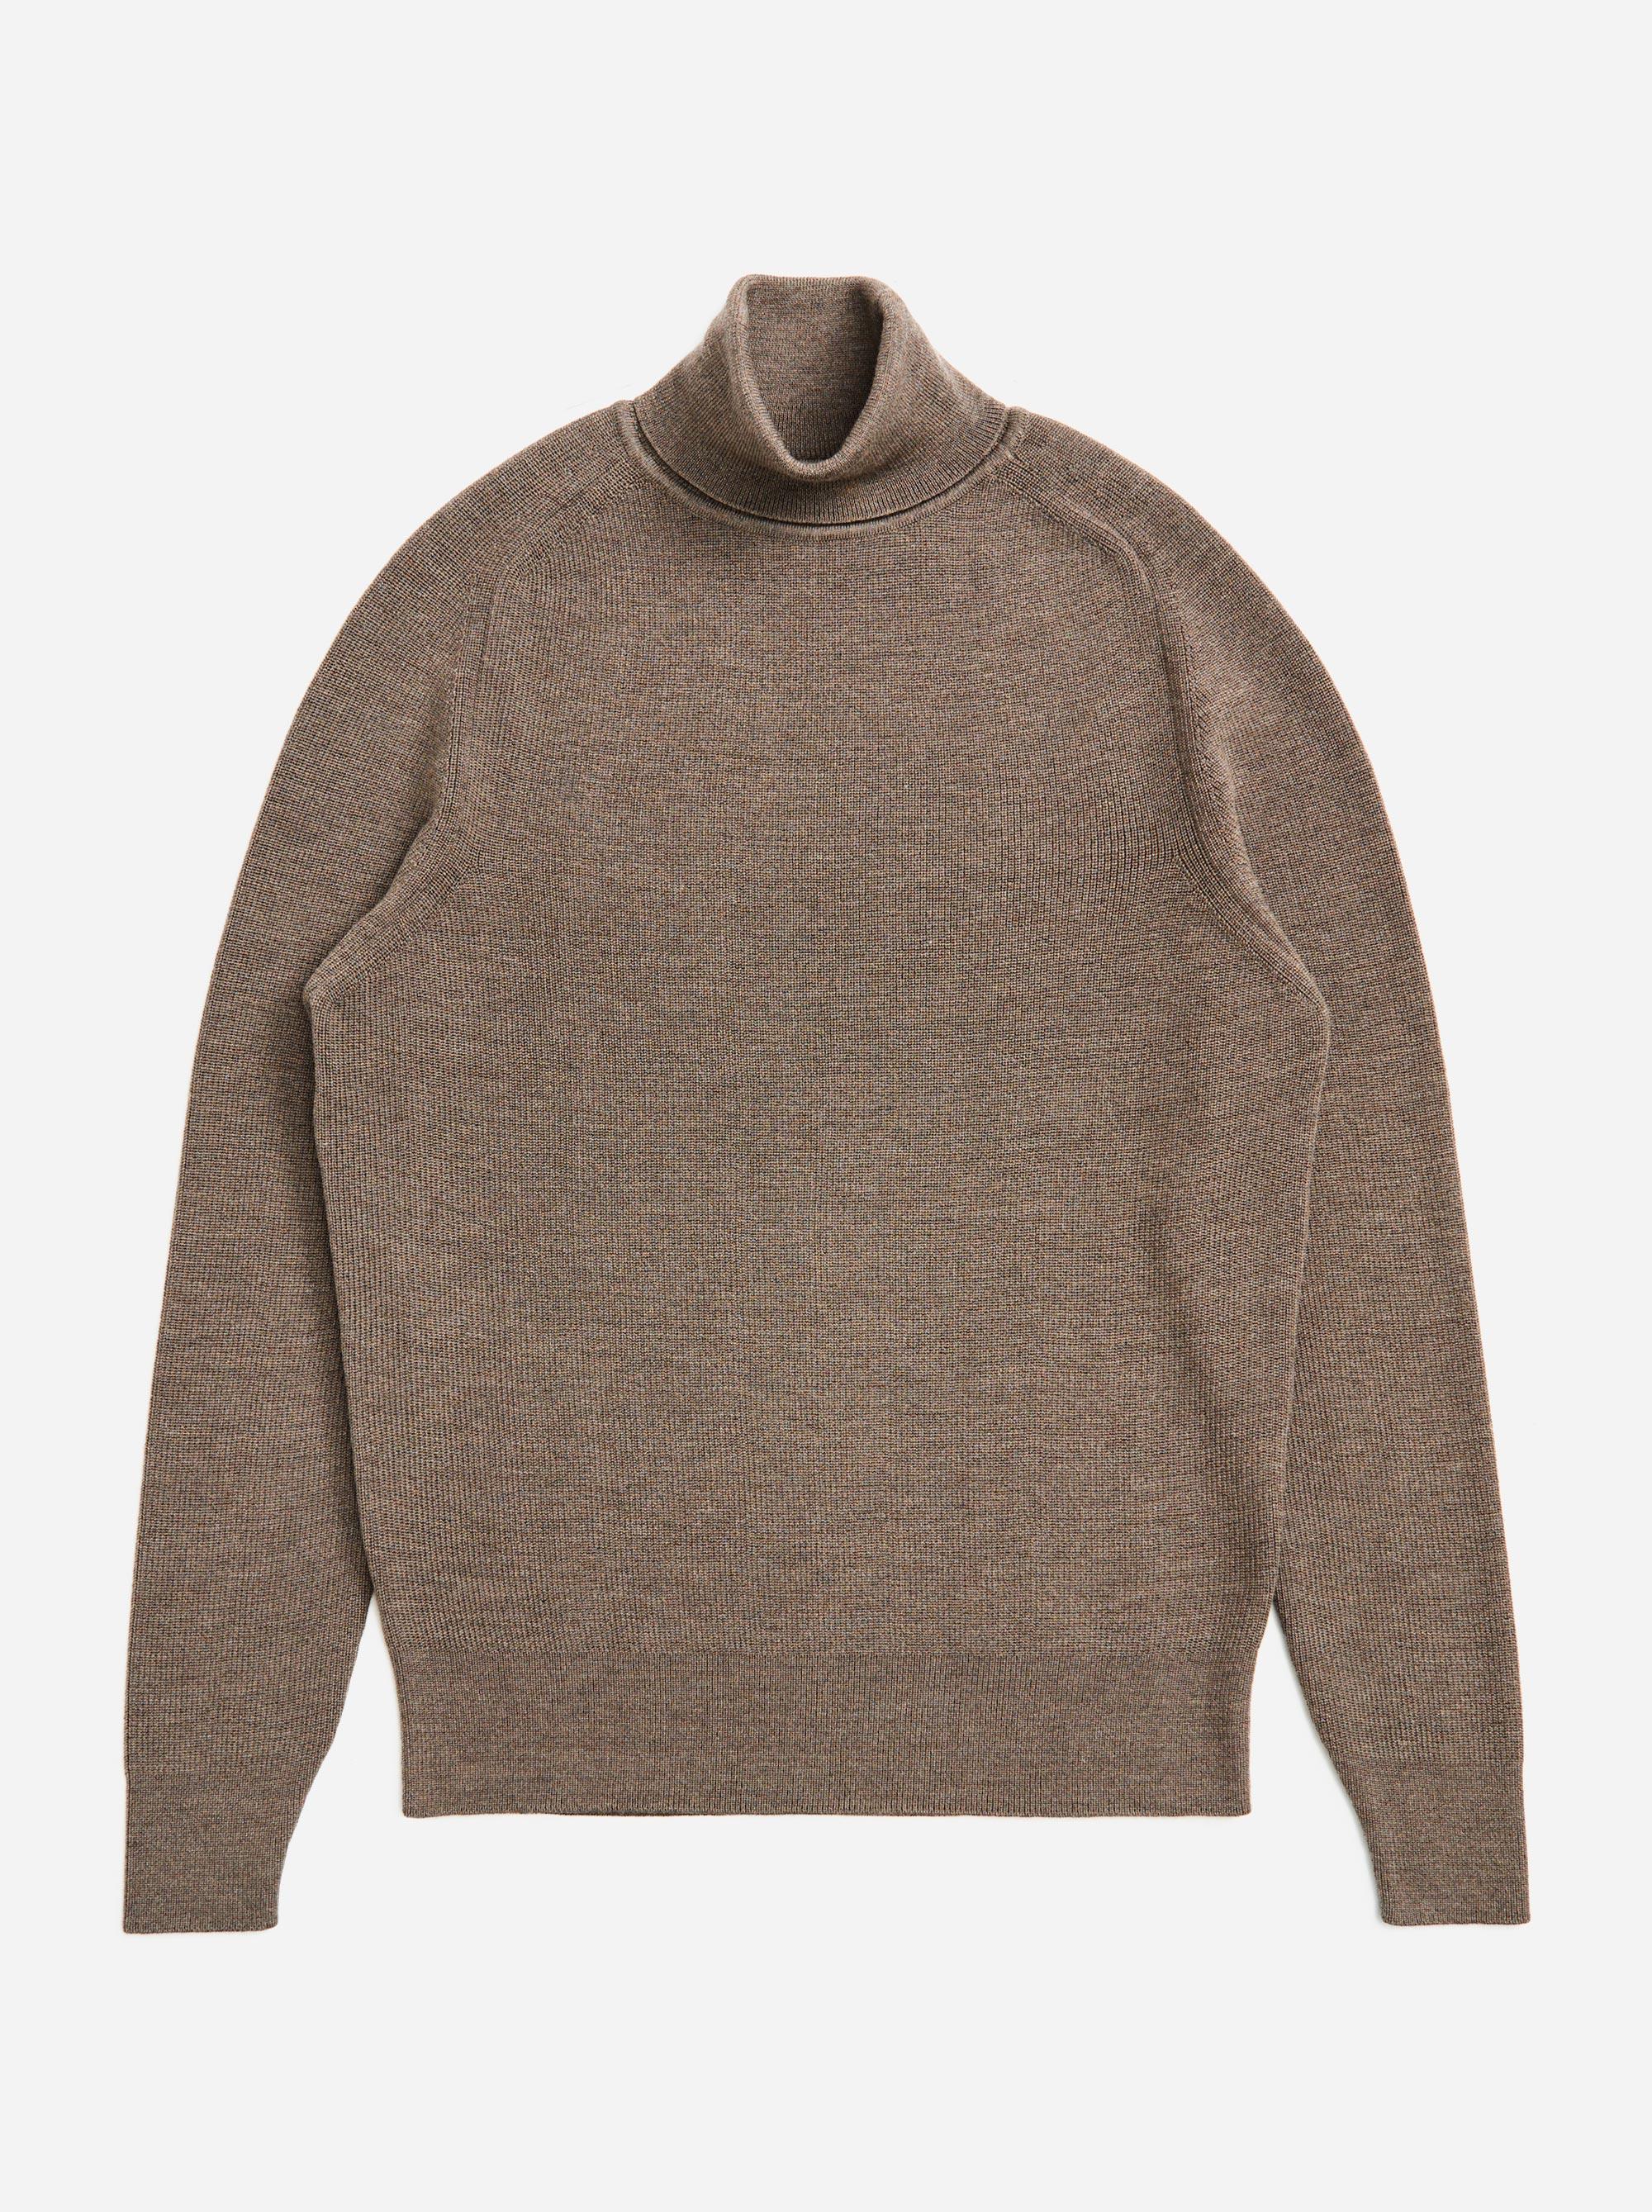 Teym - Turtleneck - The Merino Sweater - Men - Grey - 4